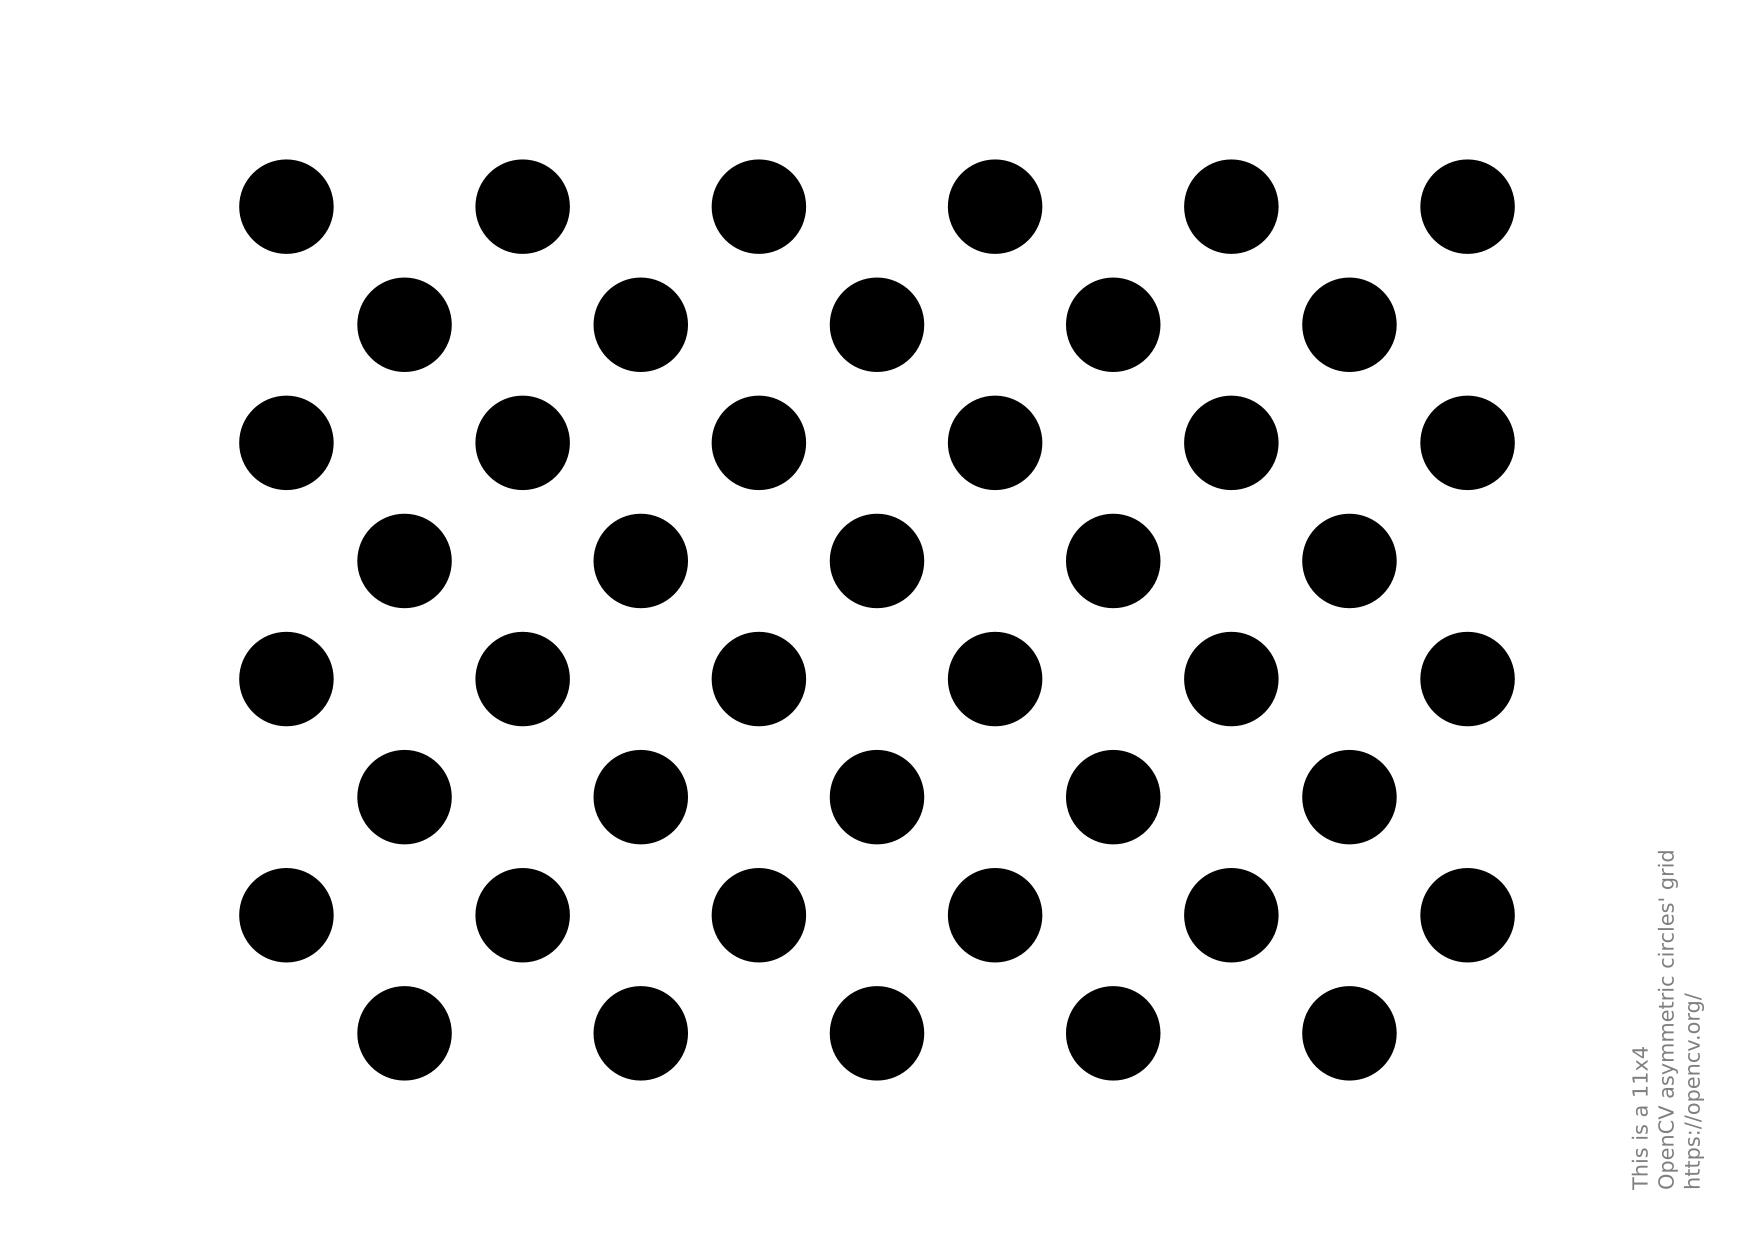 acircles_pattern.png